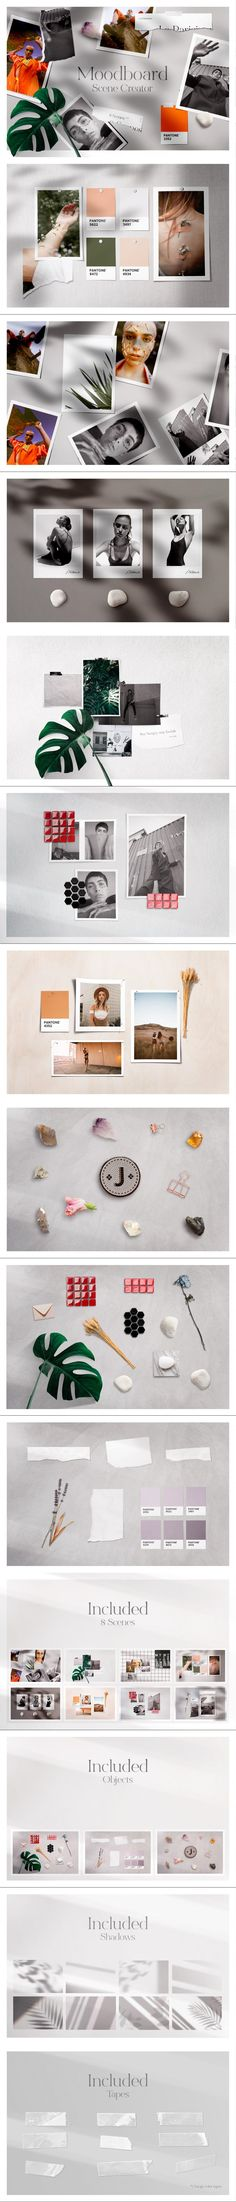 MoodBoard Mockup #templates #mockup #monstera #fashion #notebook #psd #styledphotography #polaroidphotomockup #waxseal #moodboardtemplate #vintage #retro #weddinginvite #polaroid #moodboard #pattern #print #etsymockup #thinwhiteframe Torn Paper, Mockup Templates, Mood Boards, Photo S, Adobe, Fonts, Notebook, Leaves, Graphics